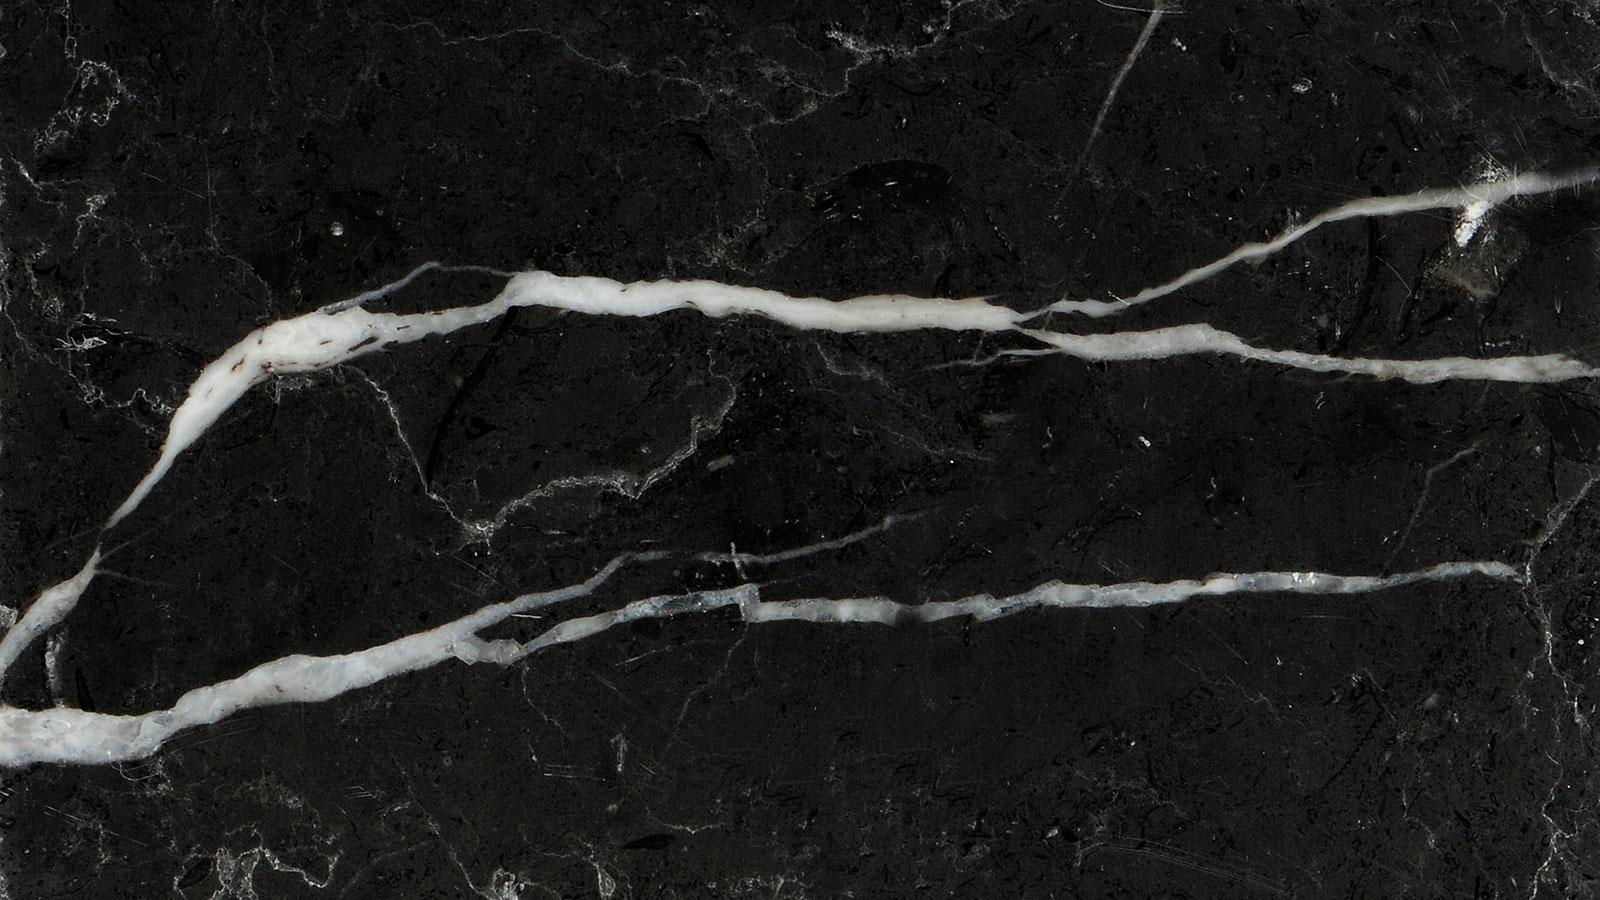 Simple Wallpaper Marble Pinterest - black-marble-wallpaper-14  You Should Have_375741.jpg